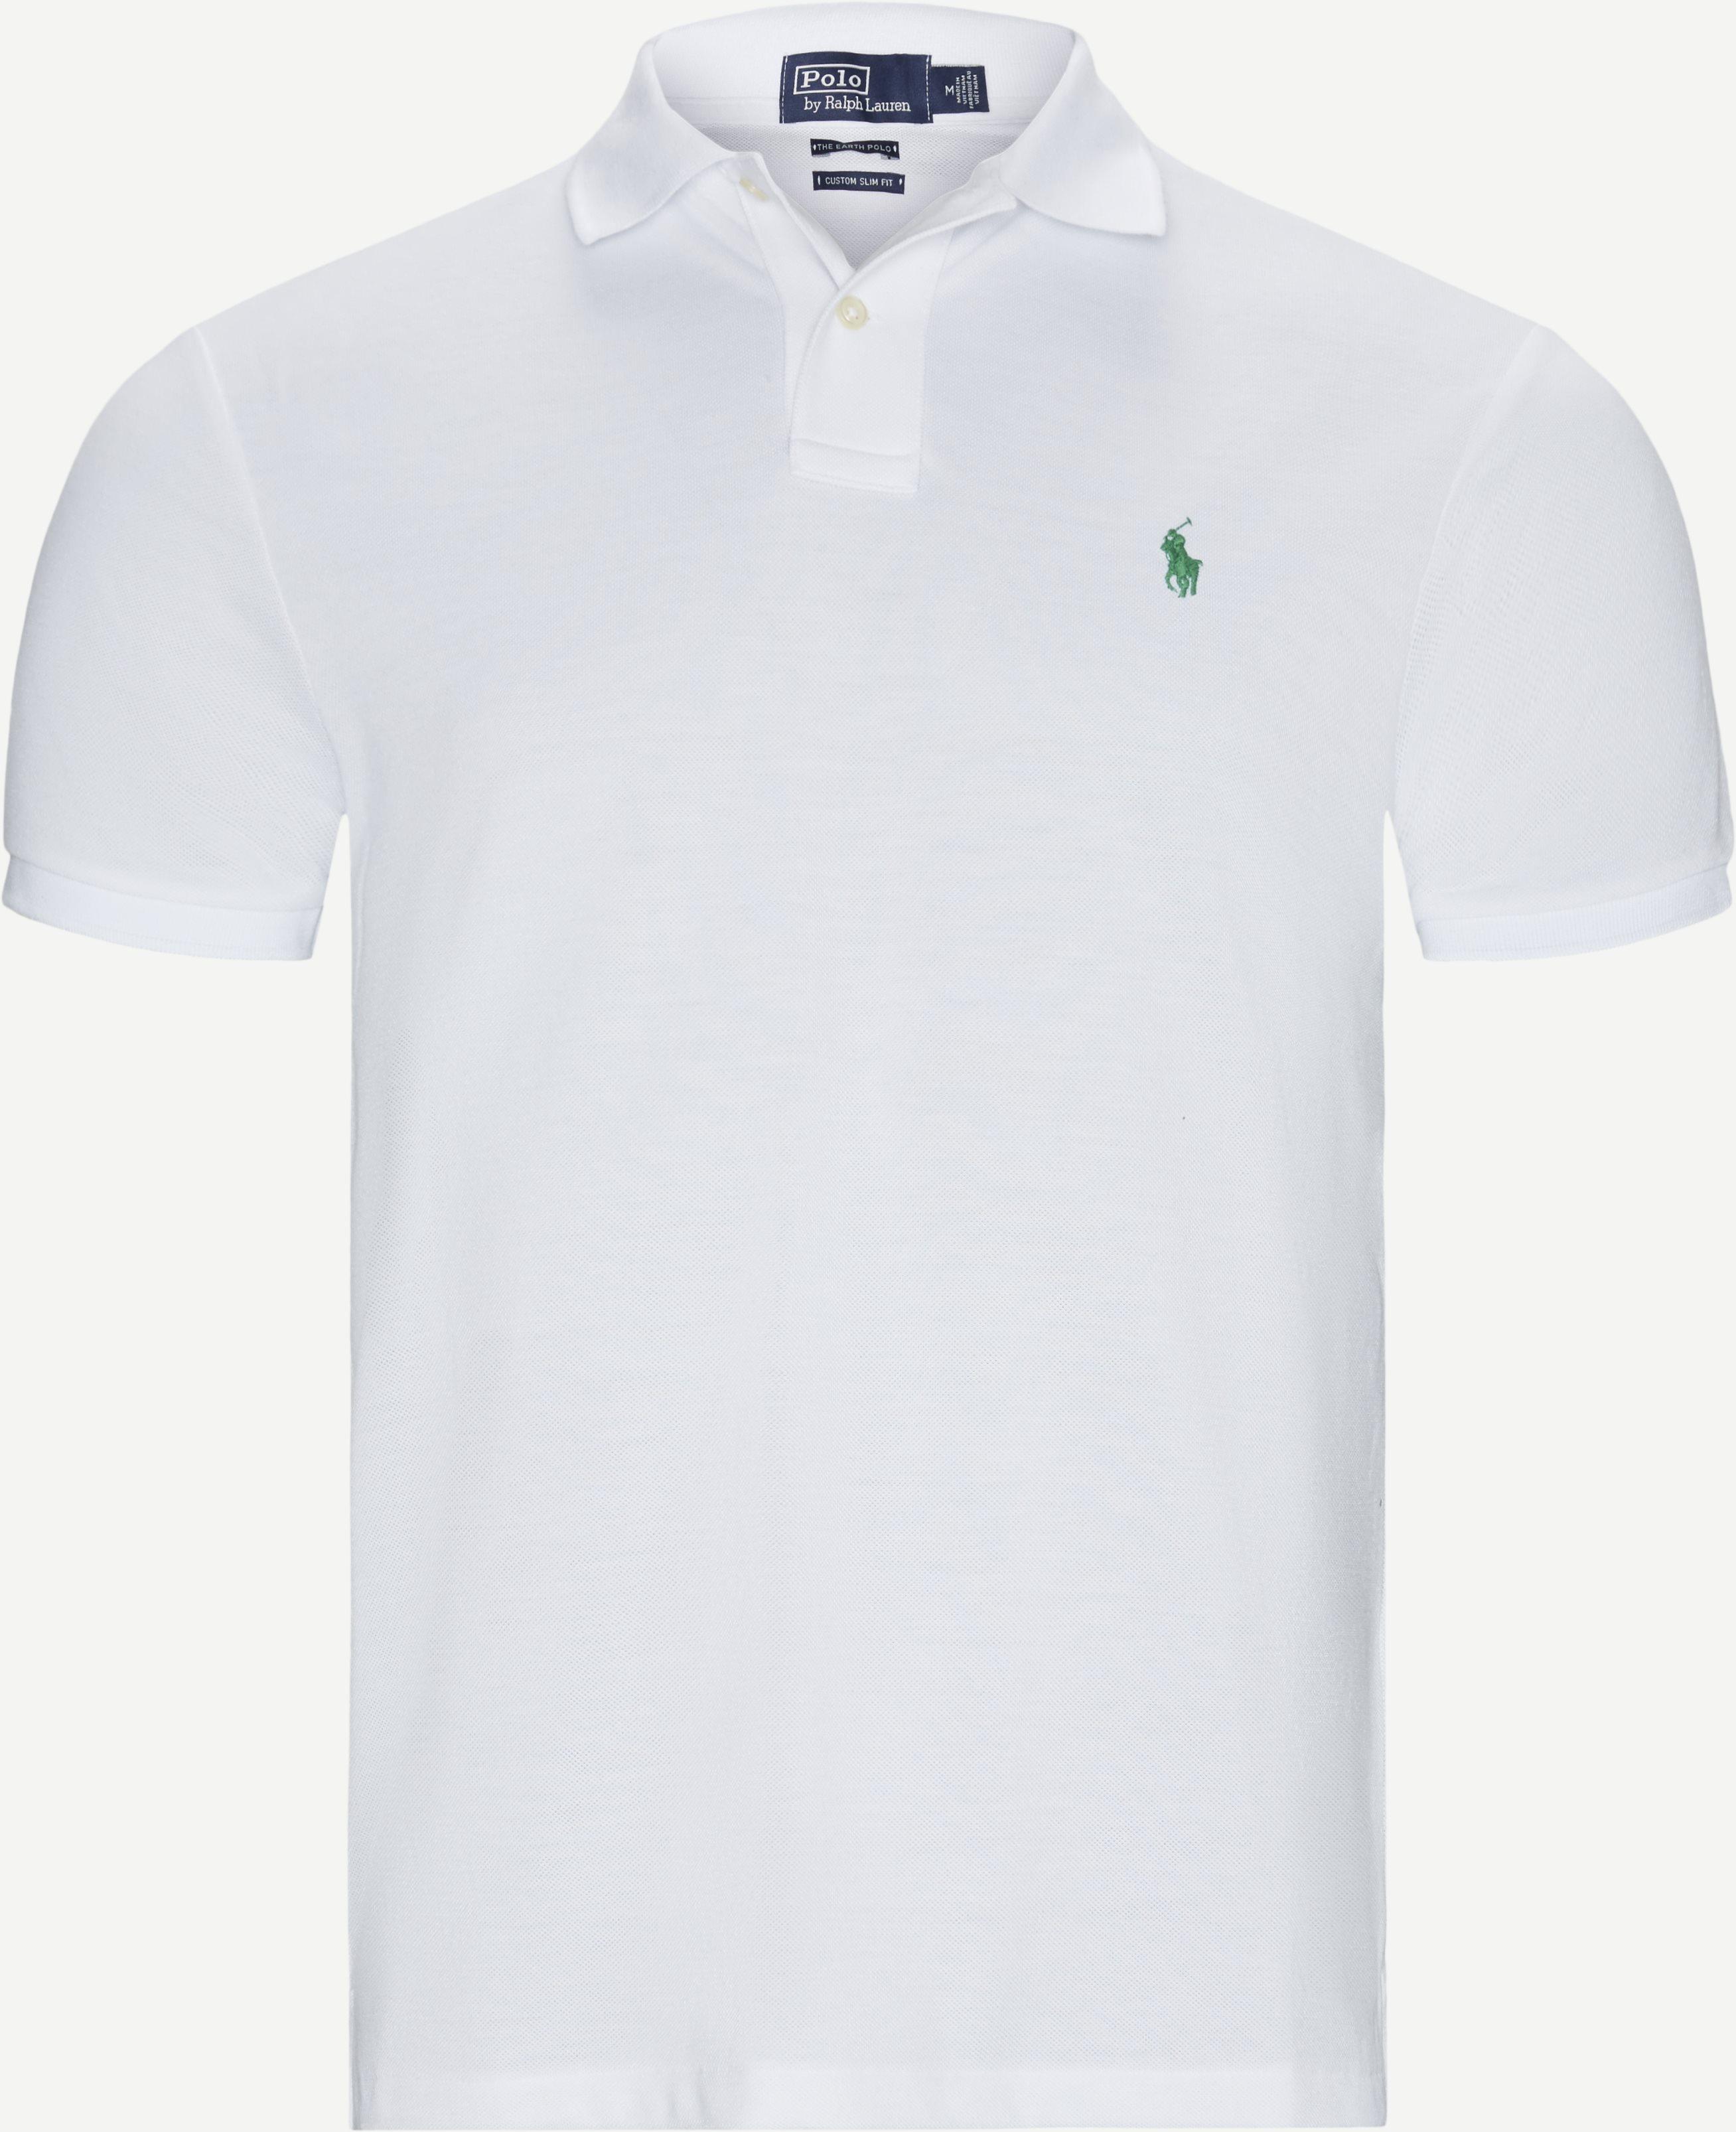 T-shirts - Regular slim fit - White